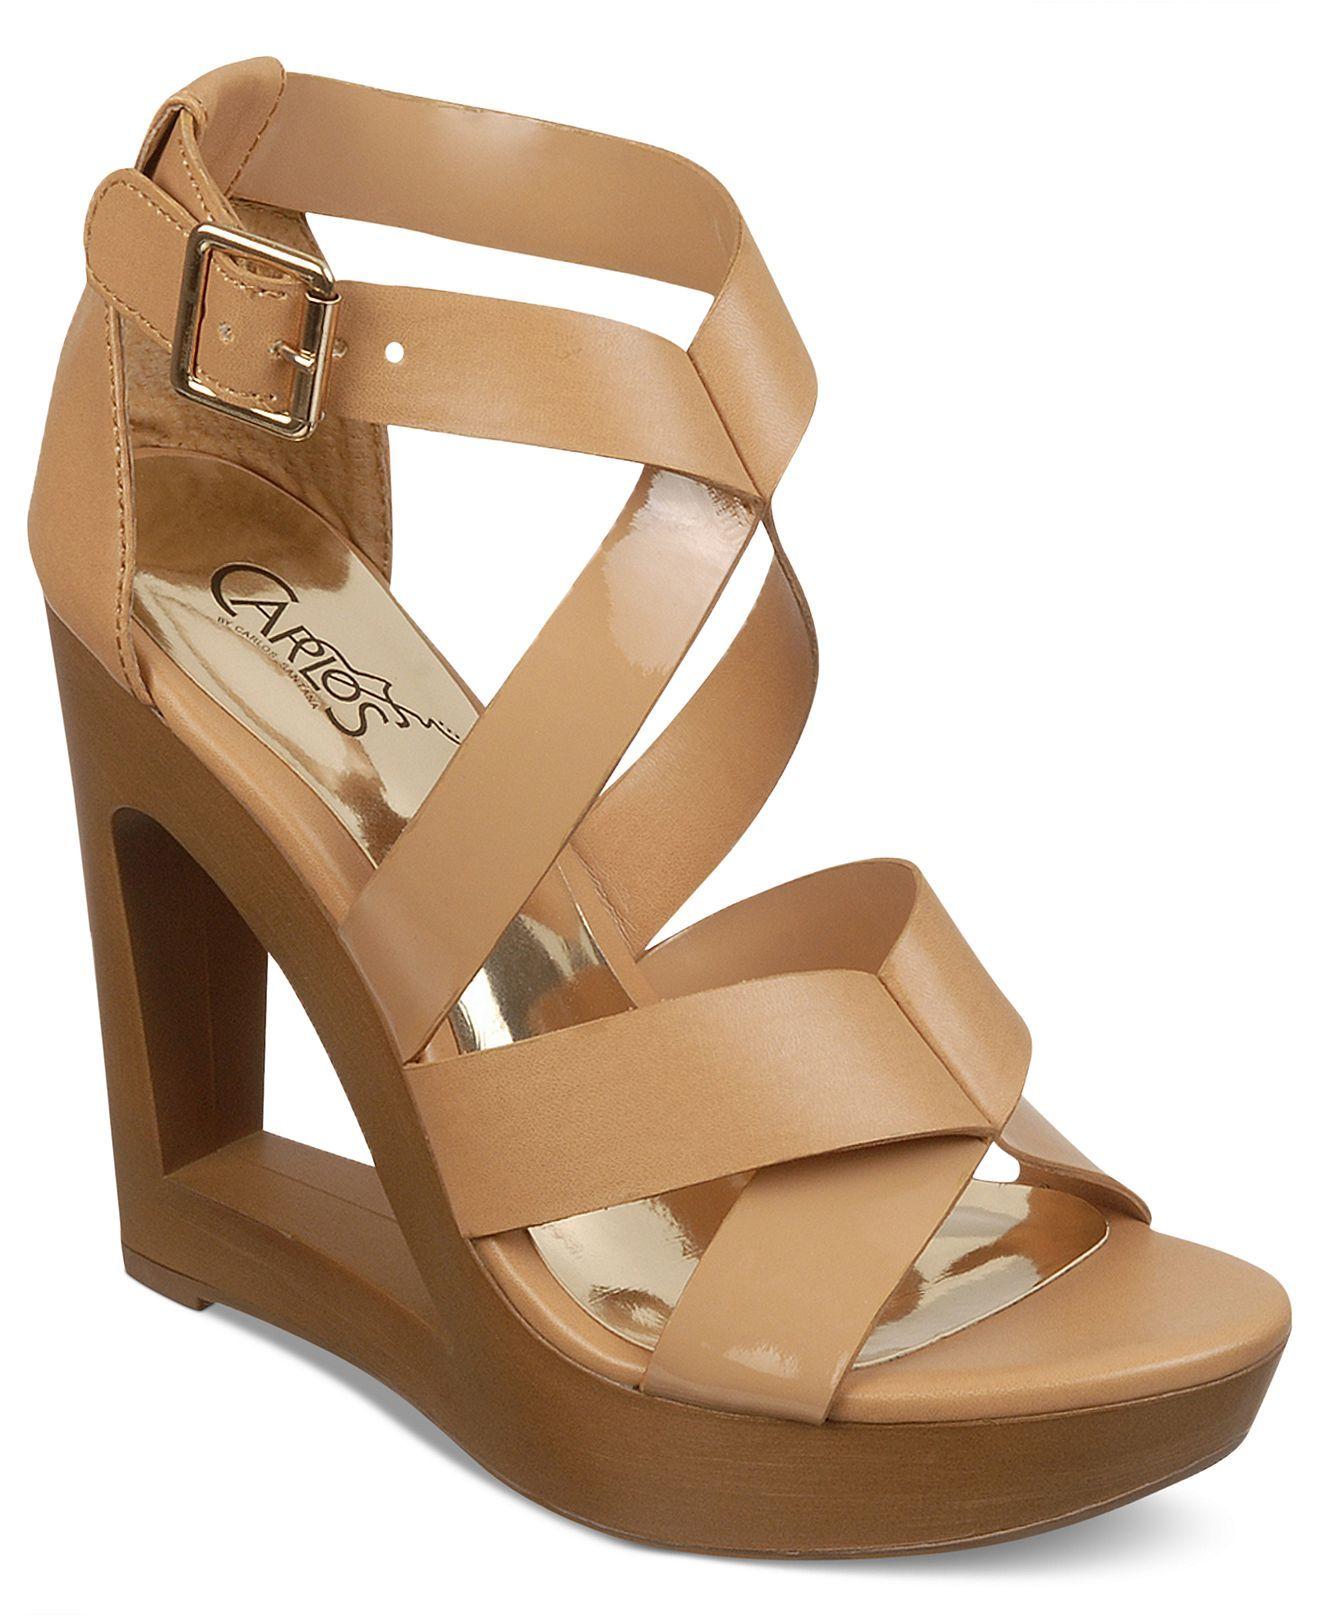 Carlos by Carlos Santana Shoes, Demi Platform Wedge Sandals